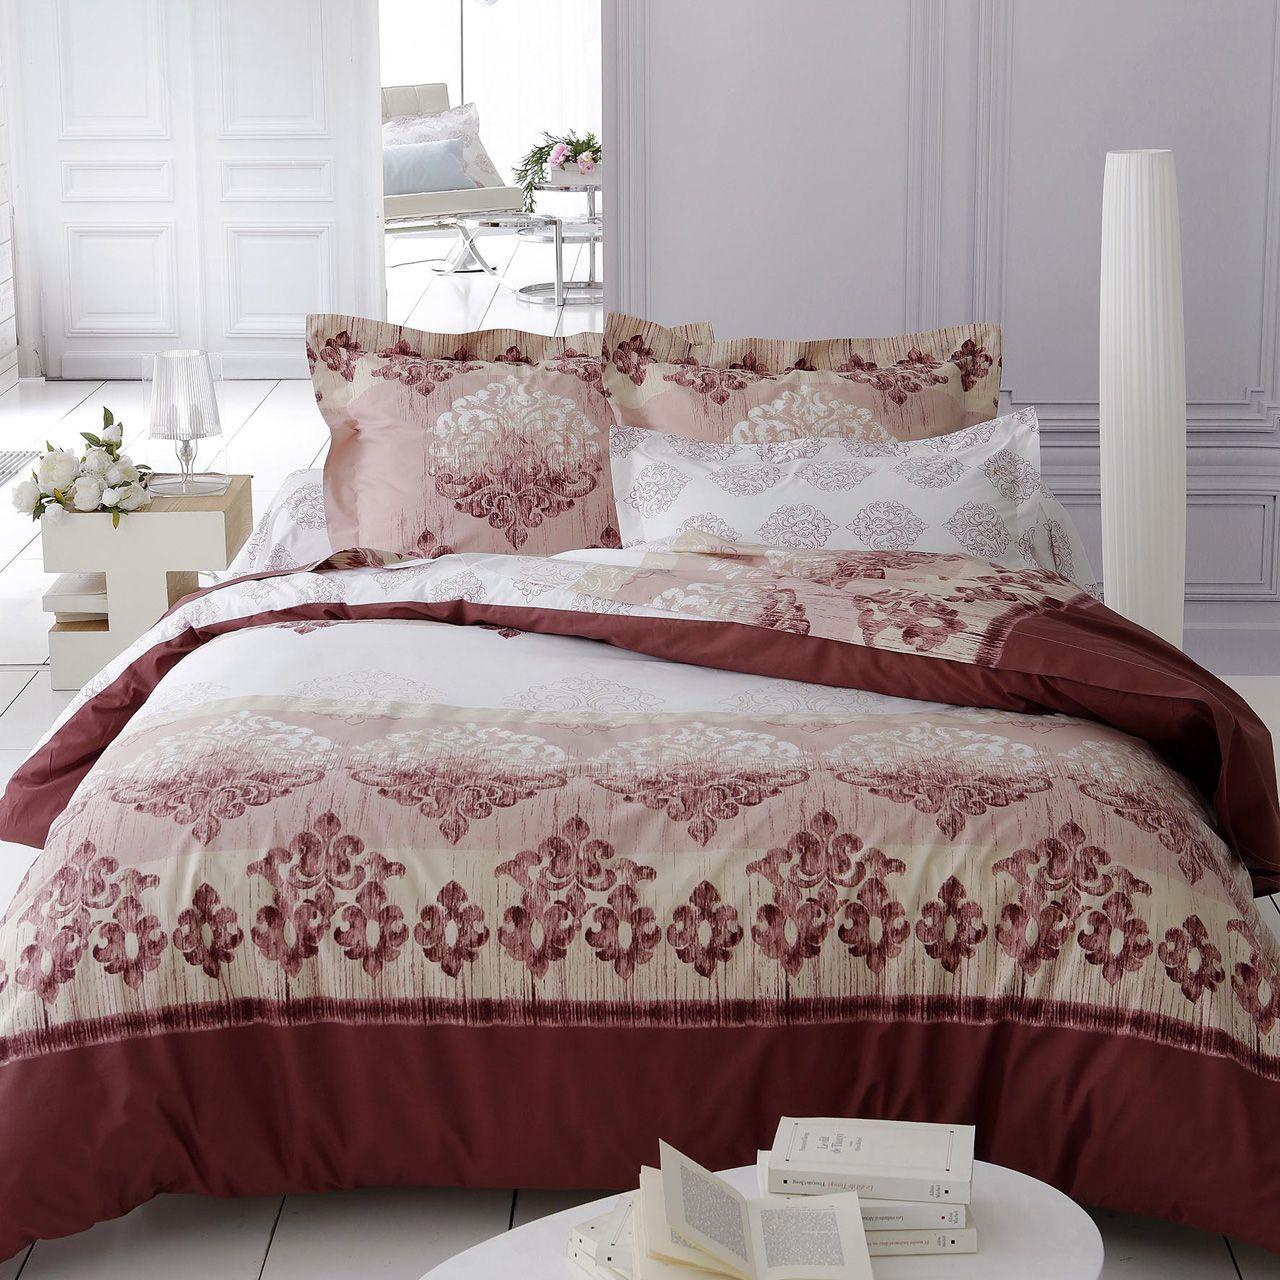 drap plat v rone marsala rouge motifs baroques percale 180x290. Black Bedroom Furniture Sets. Home Design Ideas